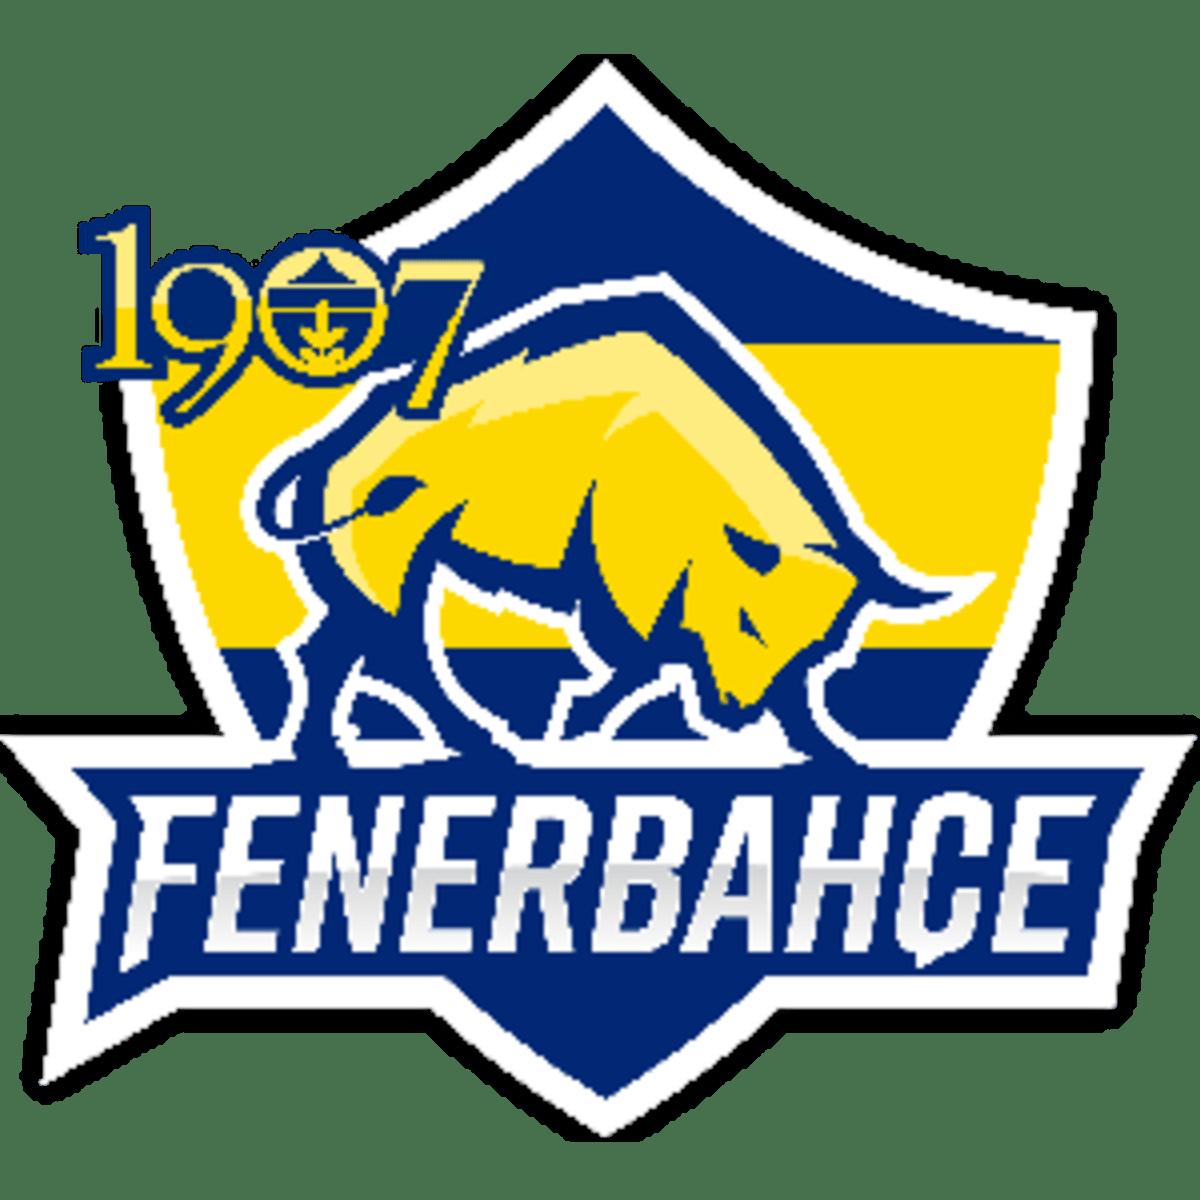 1907 Fenerbahe E Spor Vikipedi